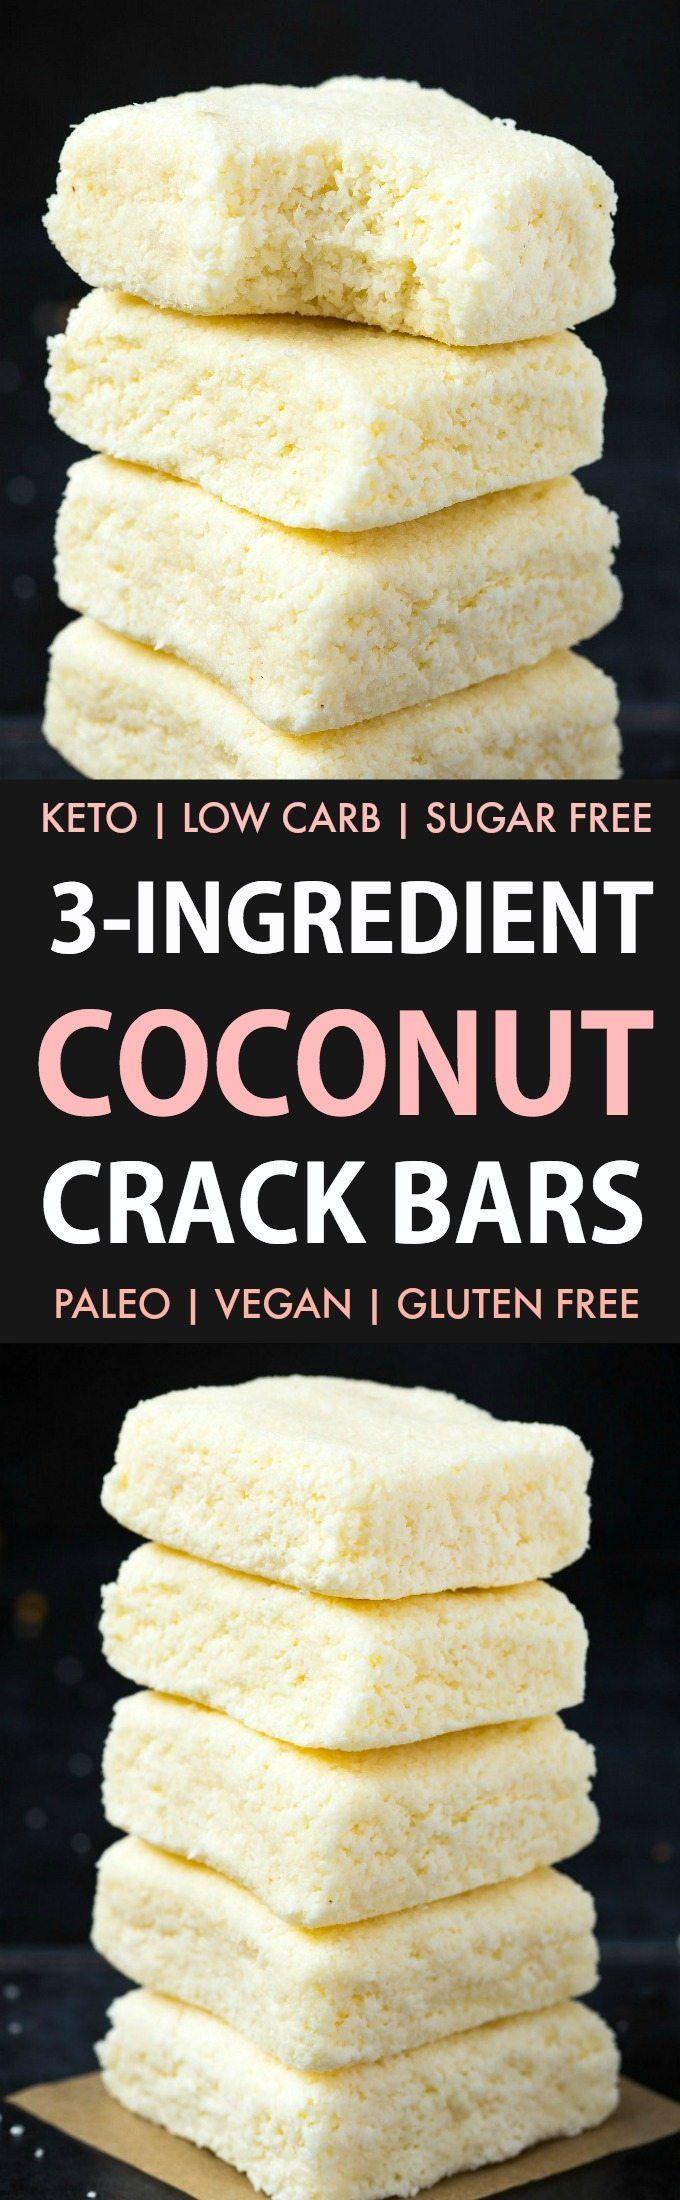 3 Ingredient Paleo Vegan Coconut Crack Bars (Keto, Sugar Free, No Bake)